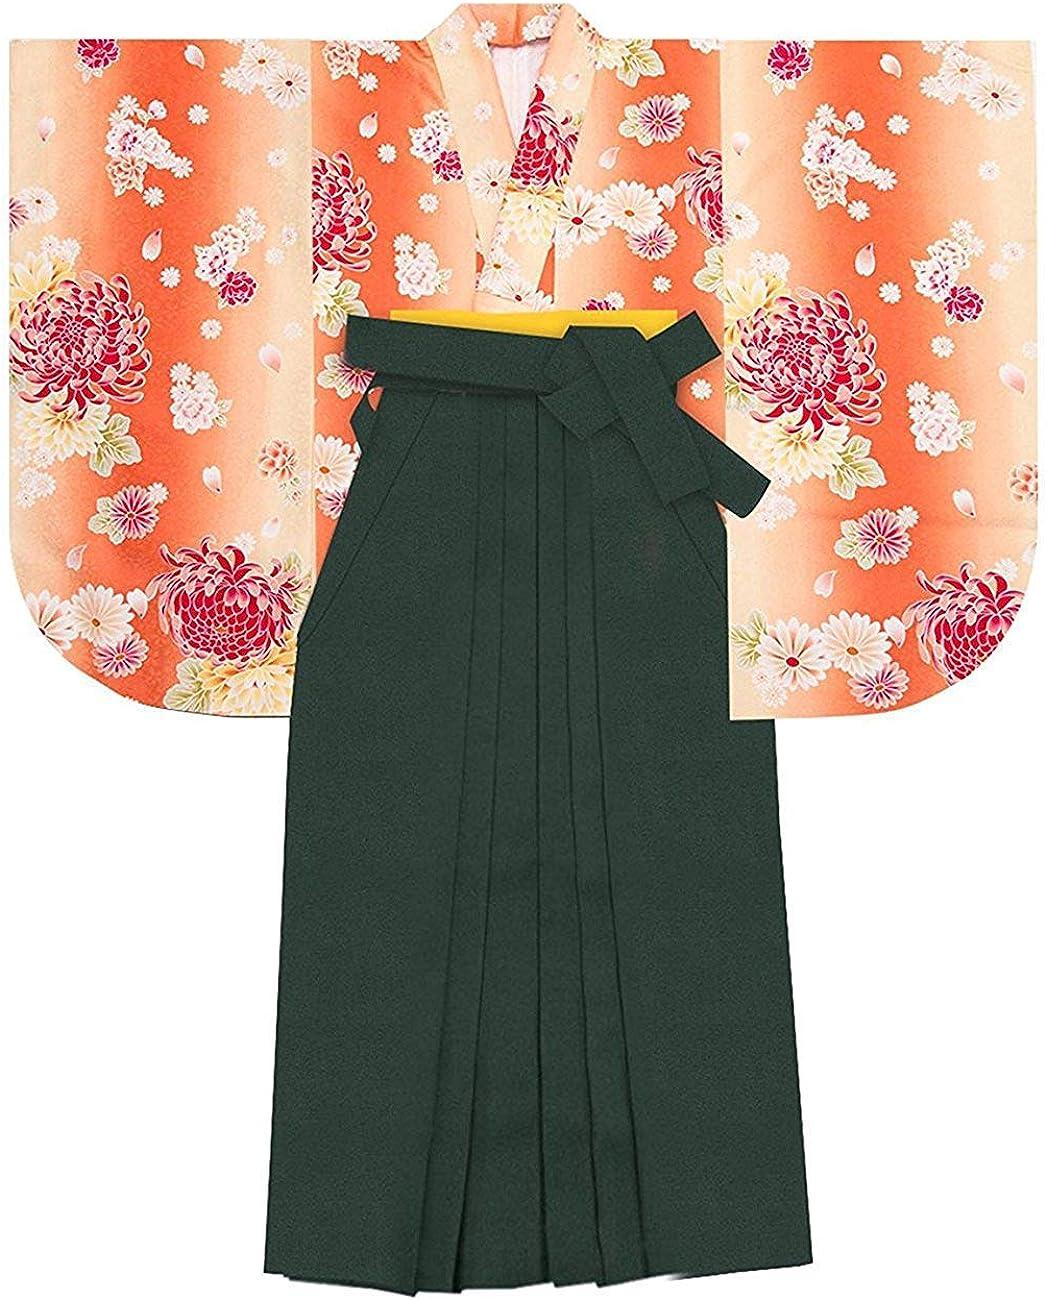 Japanese Women/'s Kimono Embroidery Gradation HAKAMA Skirt Ocean A From Japan EMS